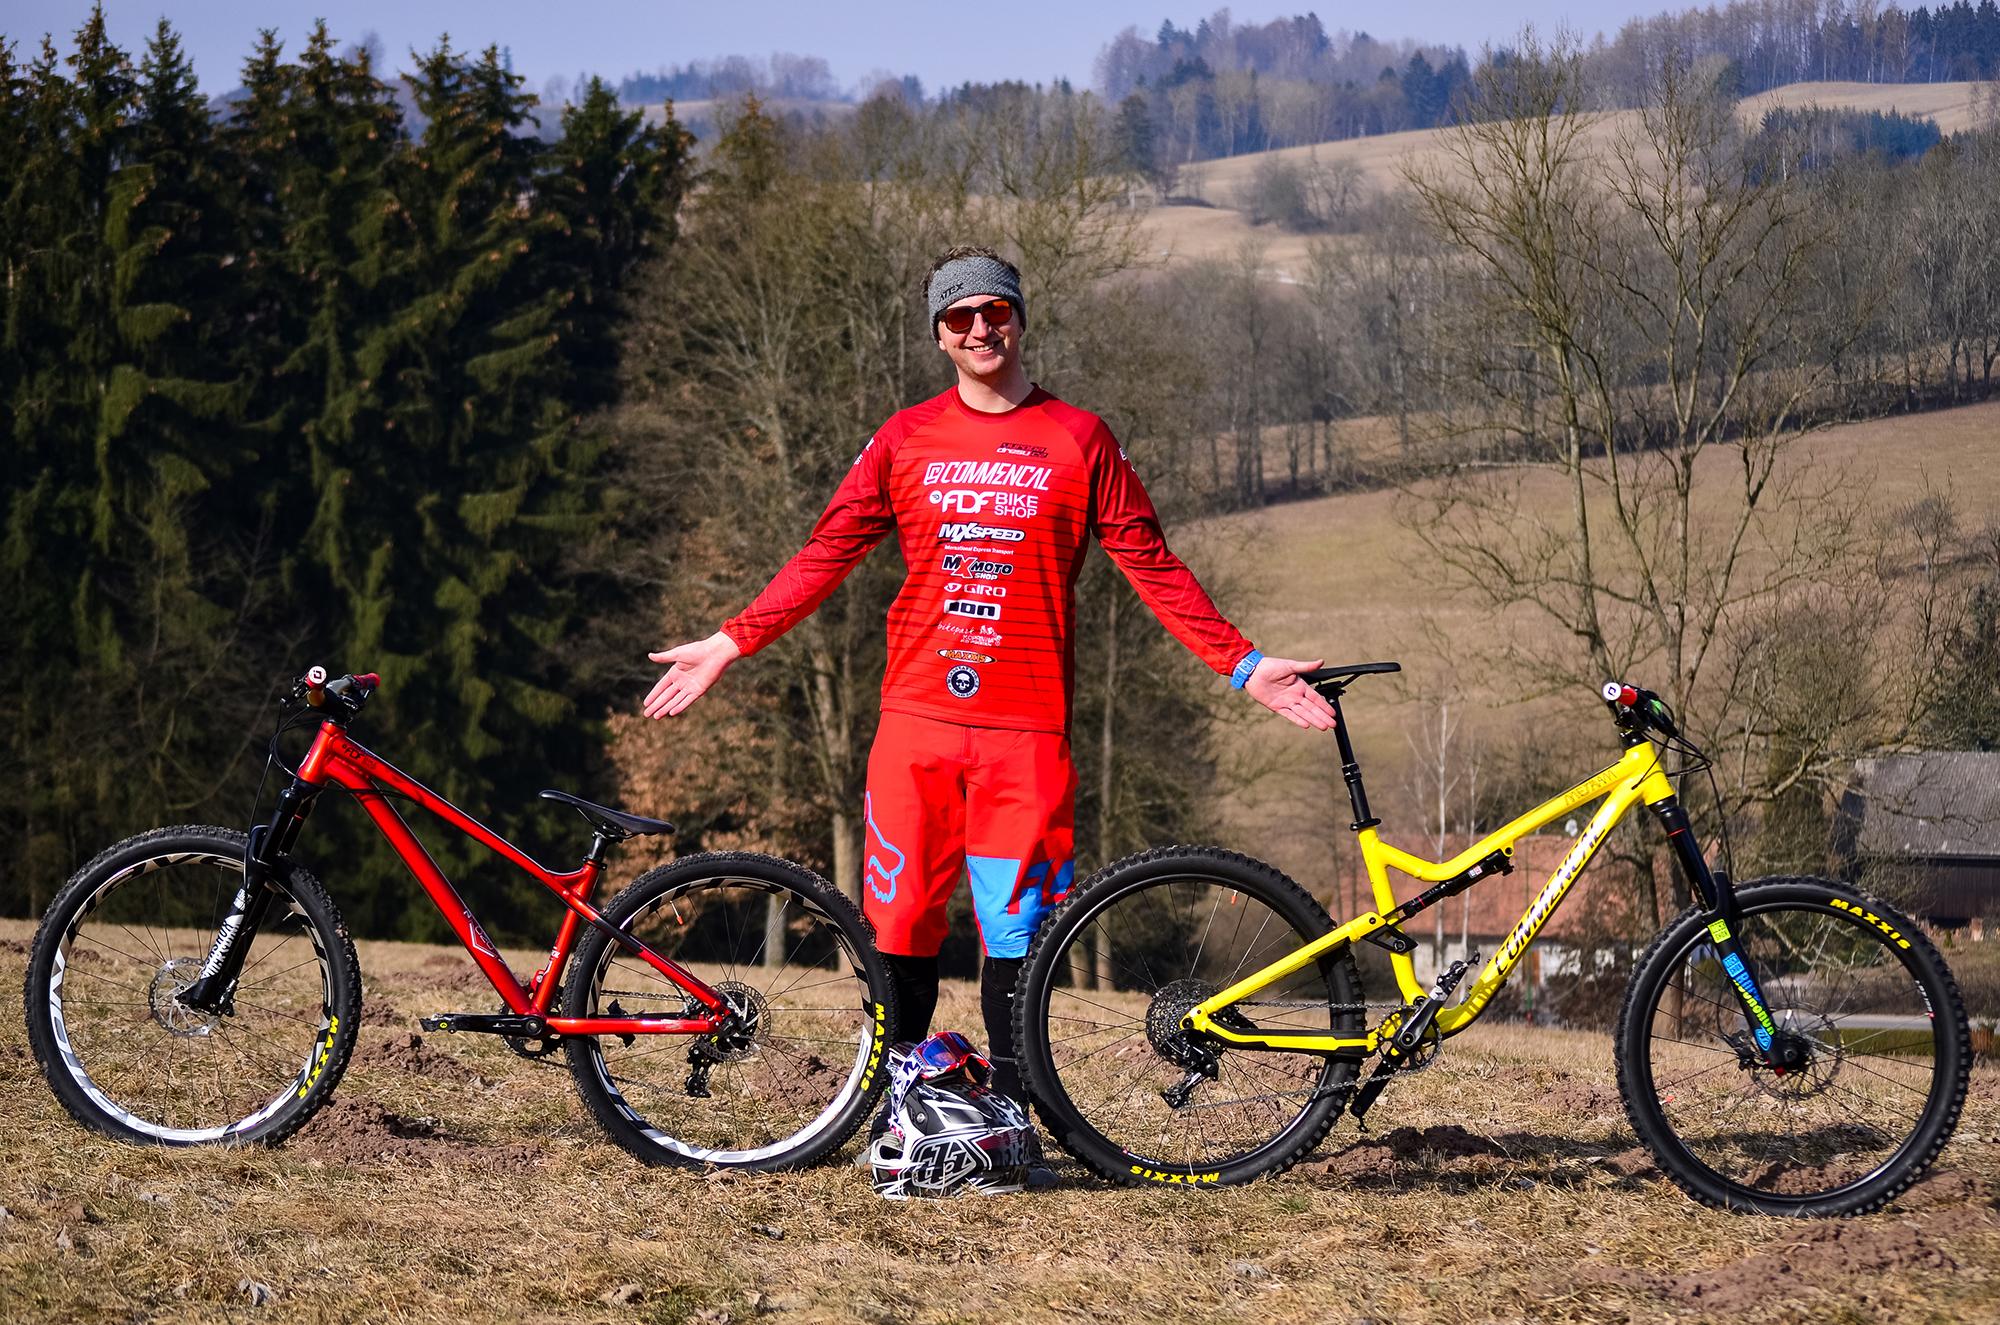 Jaroslav Faistaver Bike Check